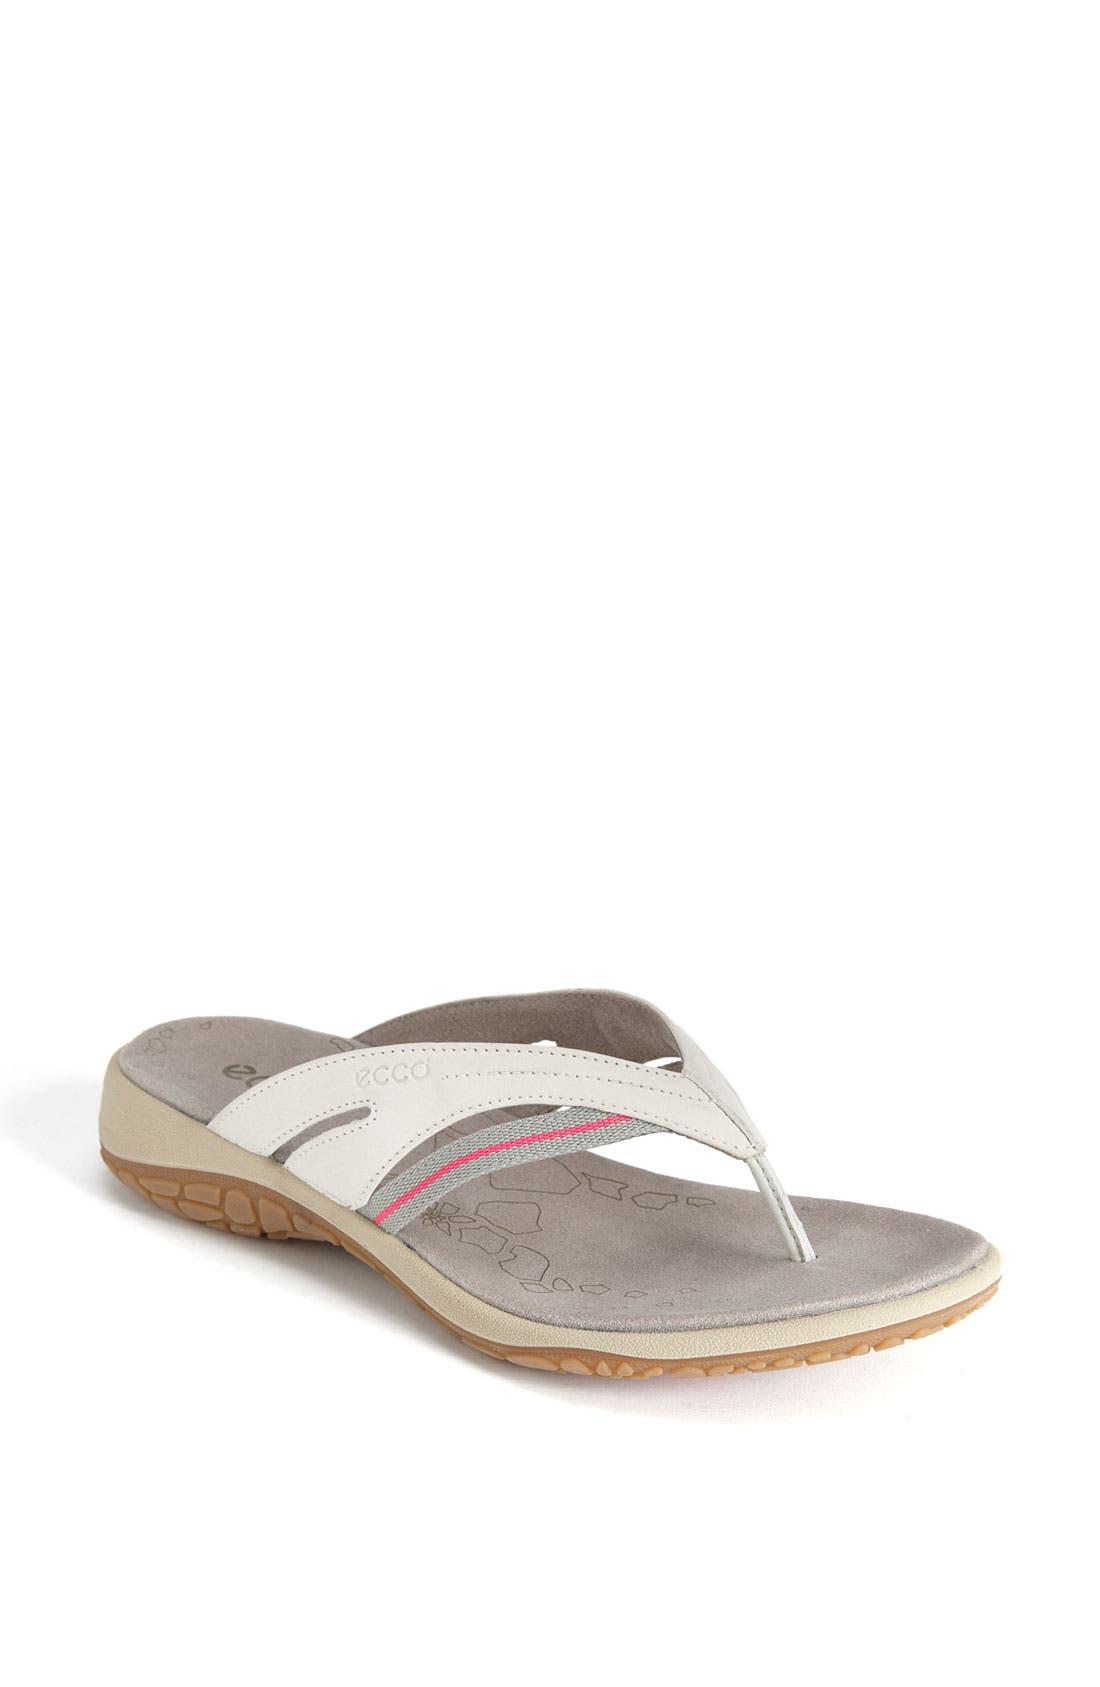 Main Image - ECCO 'Kawaii' Sandal